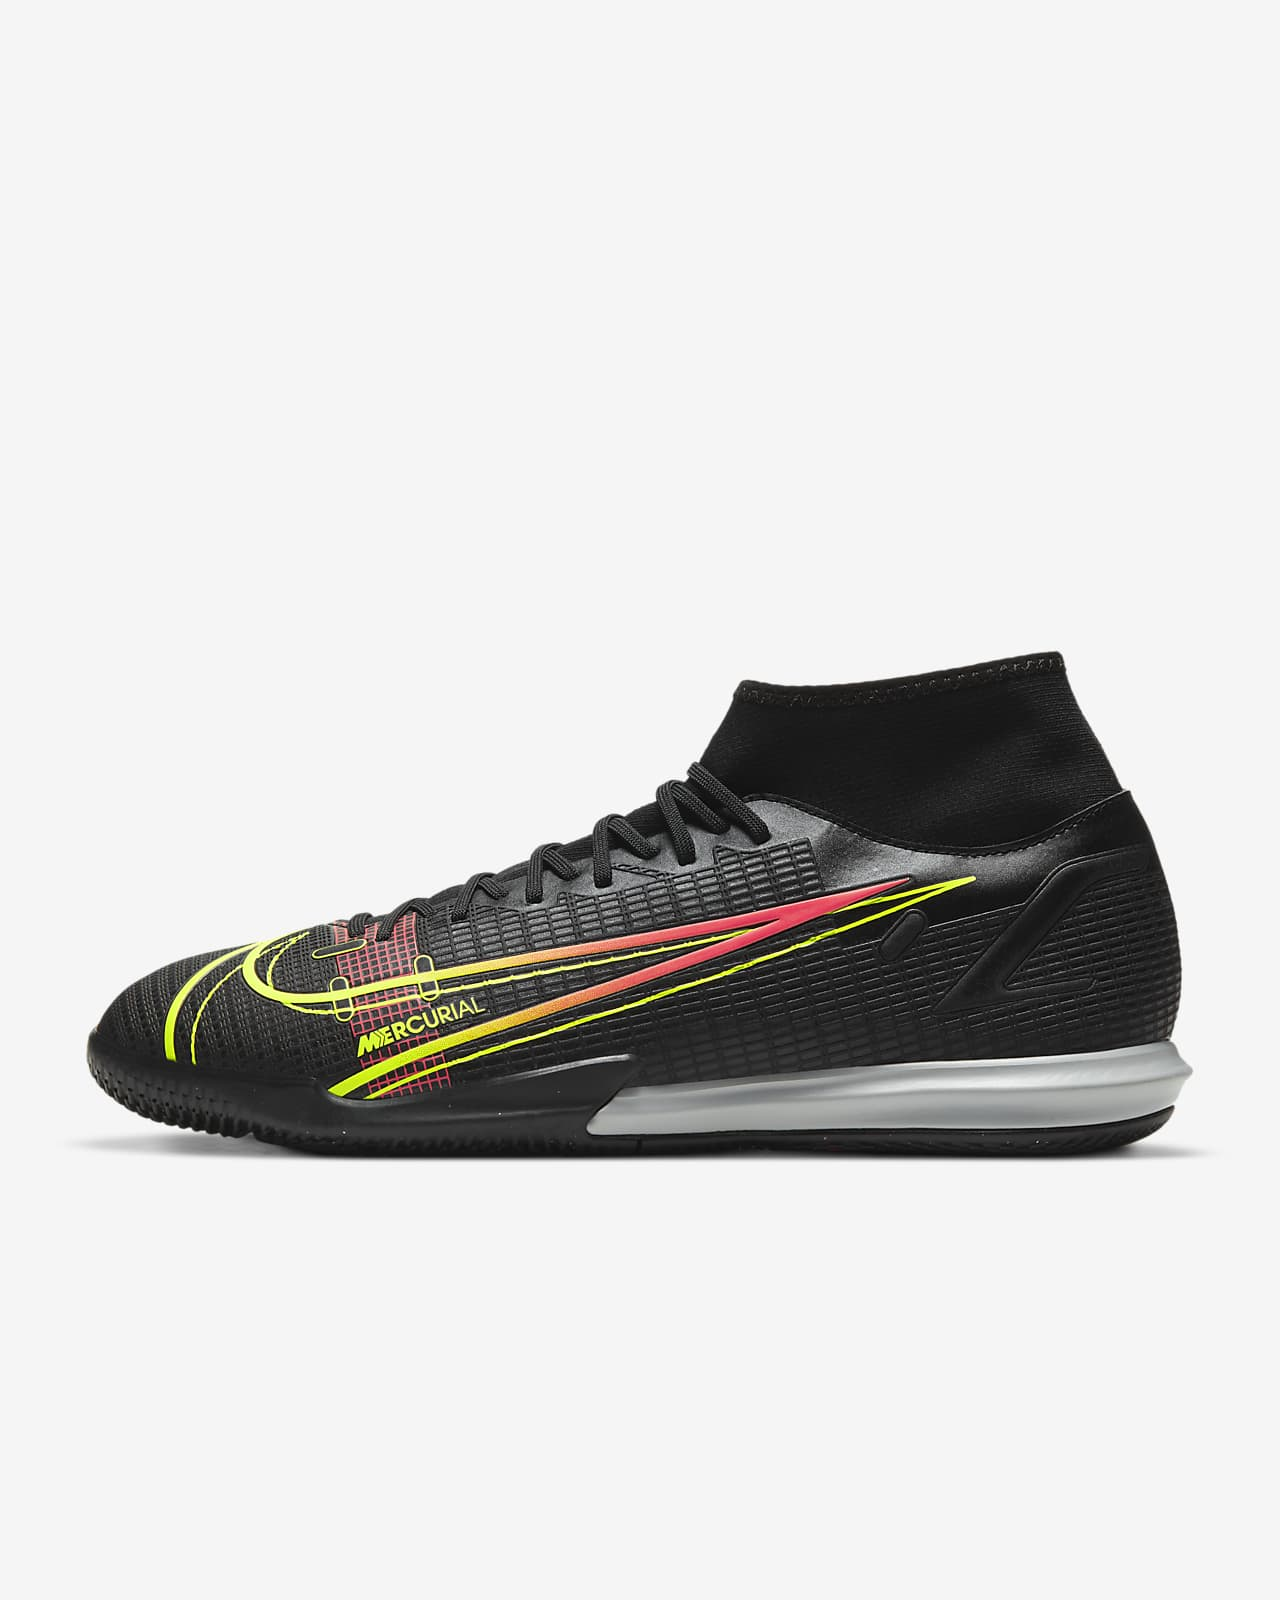 Chaussure de football en salle Nike Mercurial Superfly 8 Academy IC